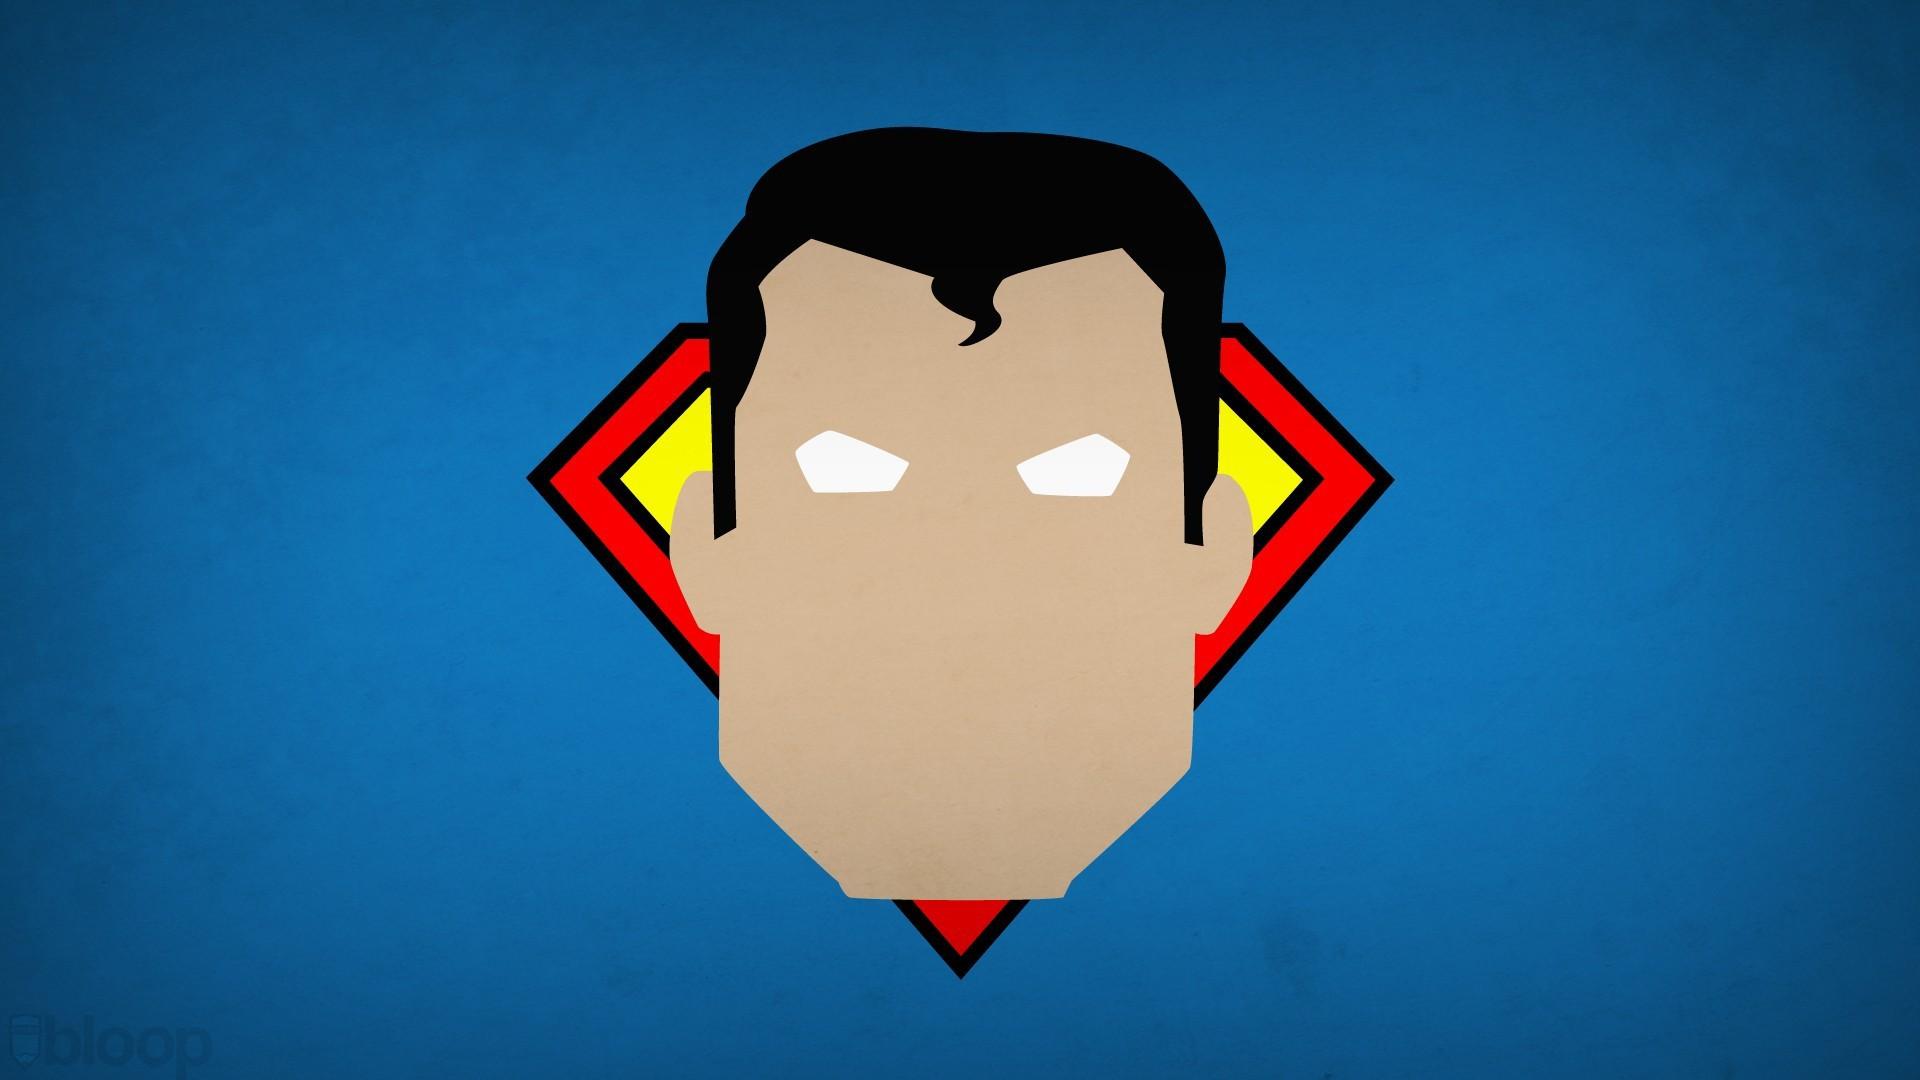 Superman Minimalism Blo0p